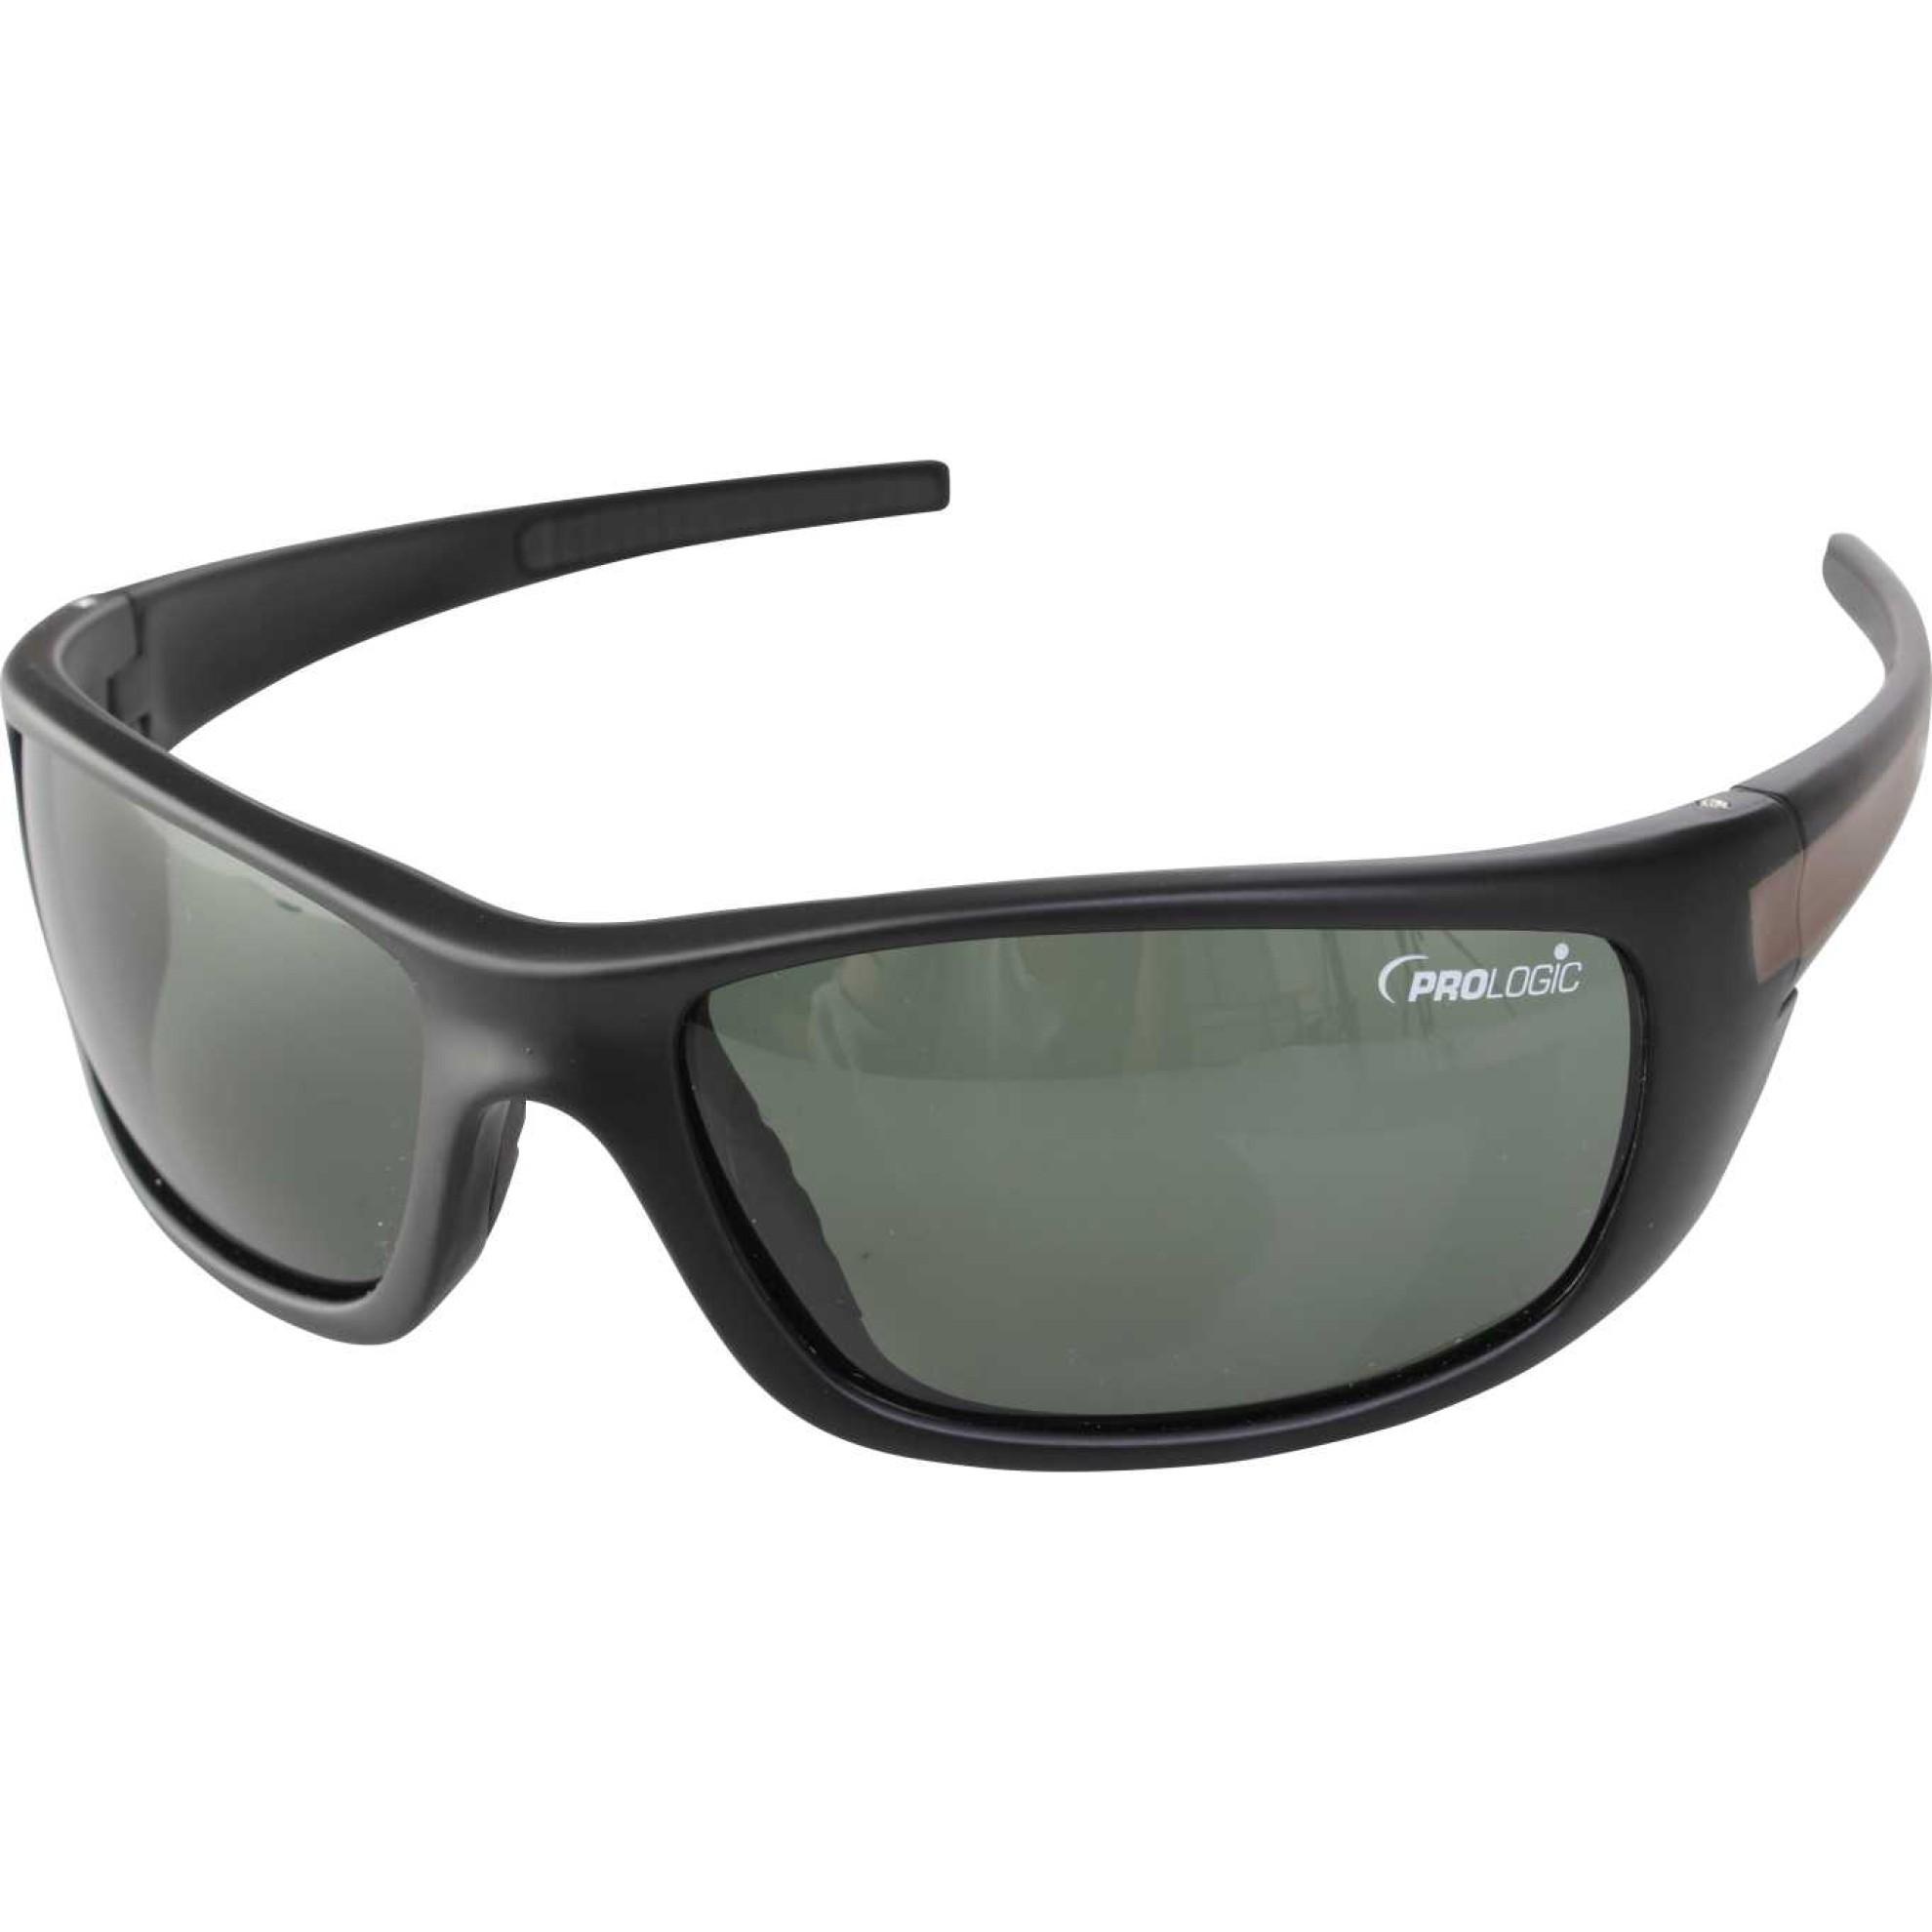 997095201d Prologic Big Gun Black Sunglasses (Gunsmoke Lenses)